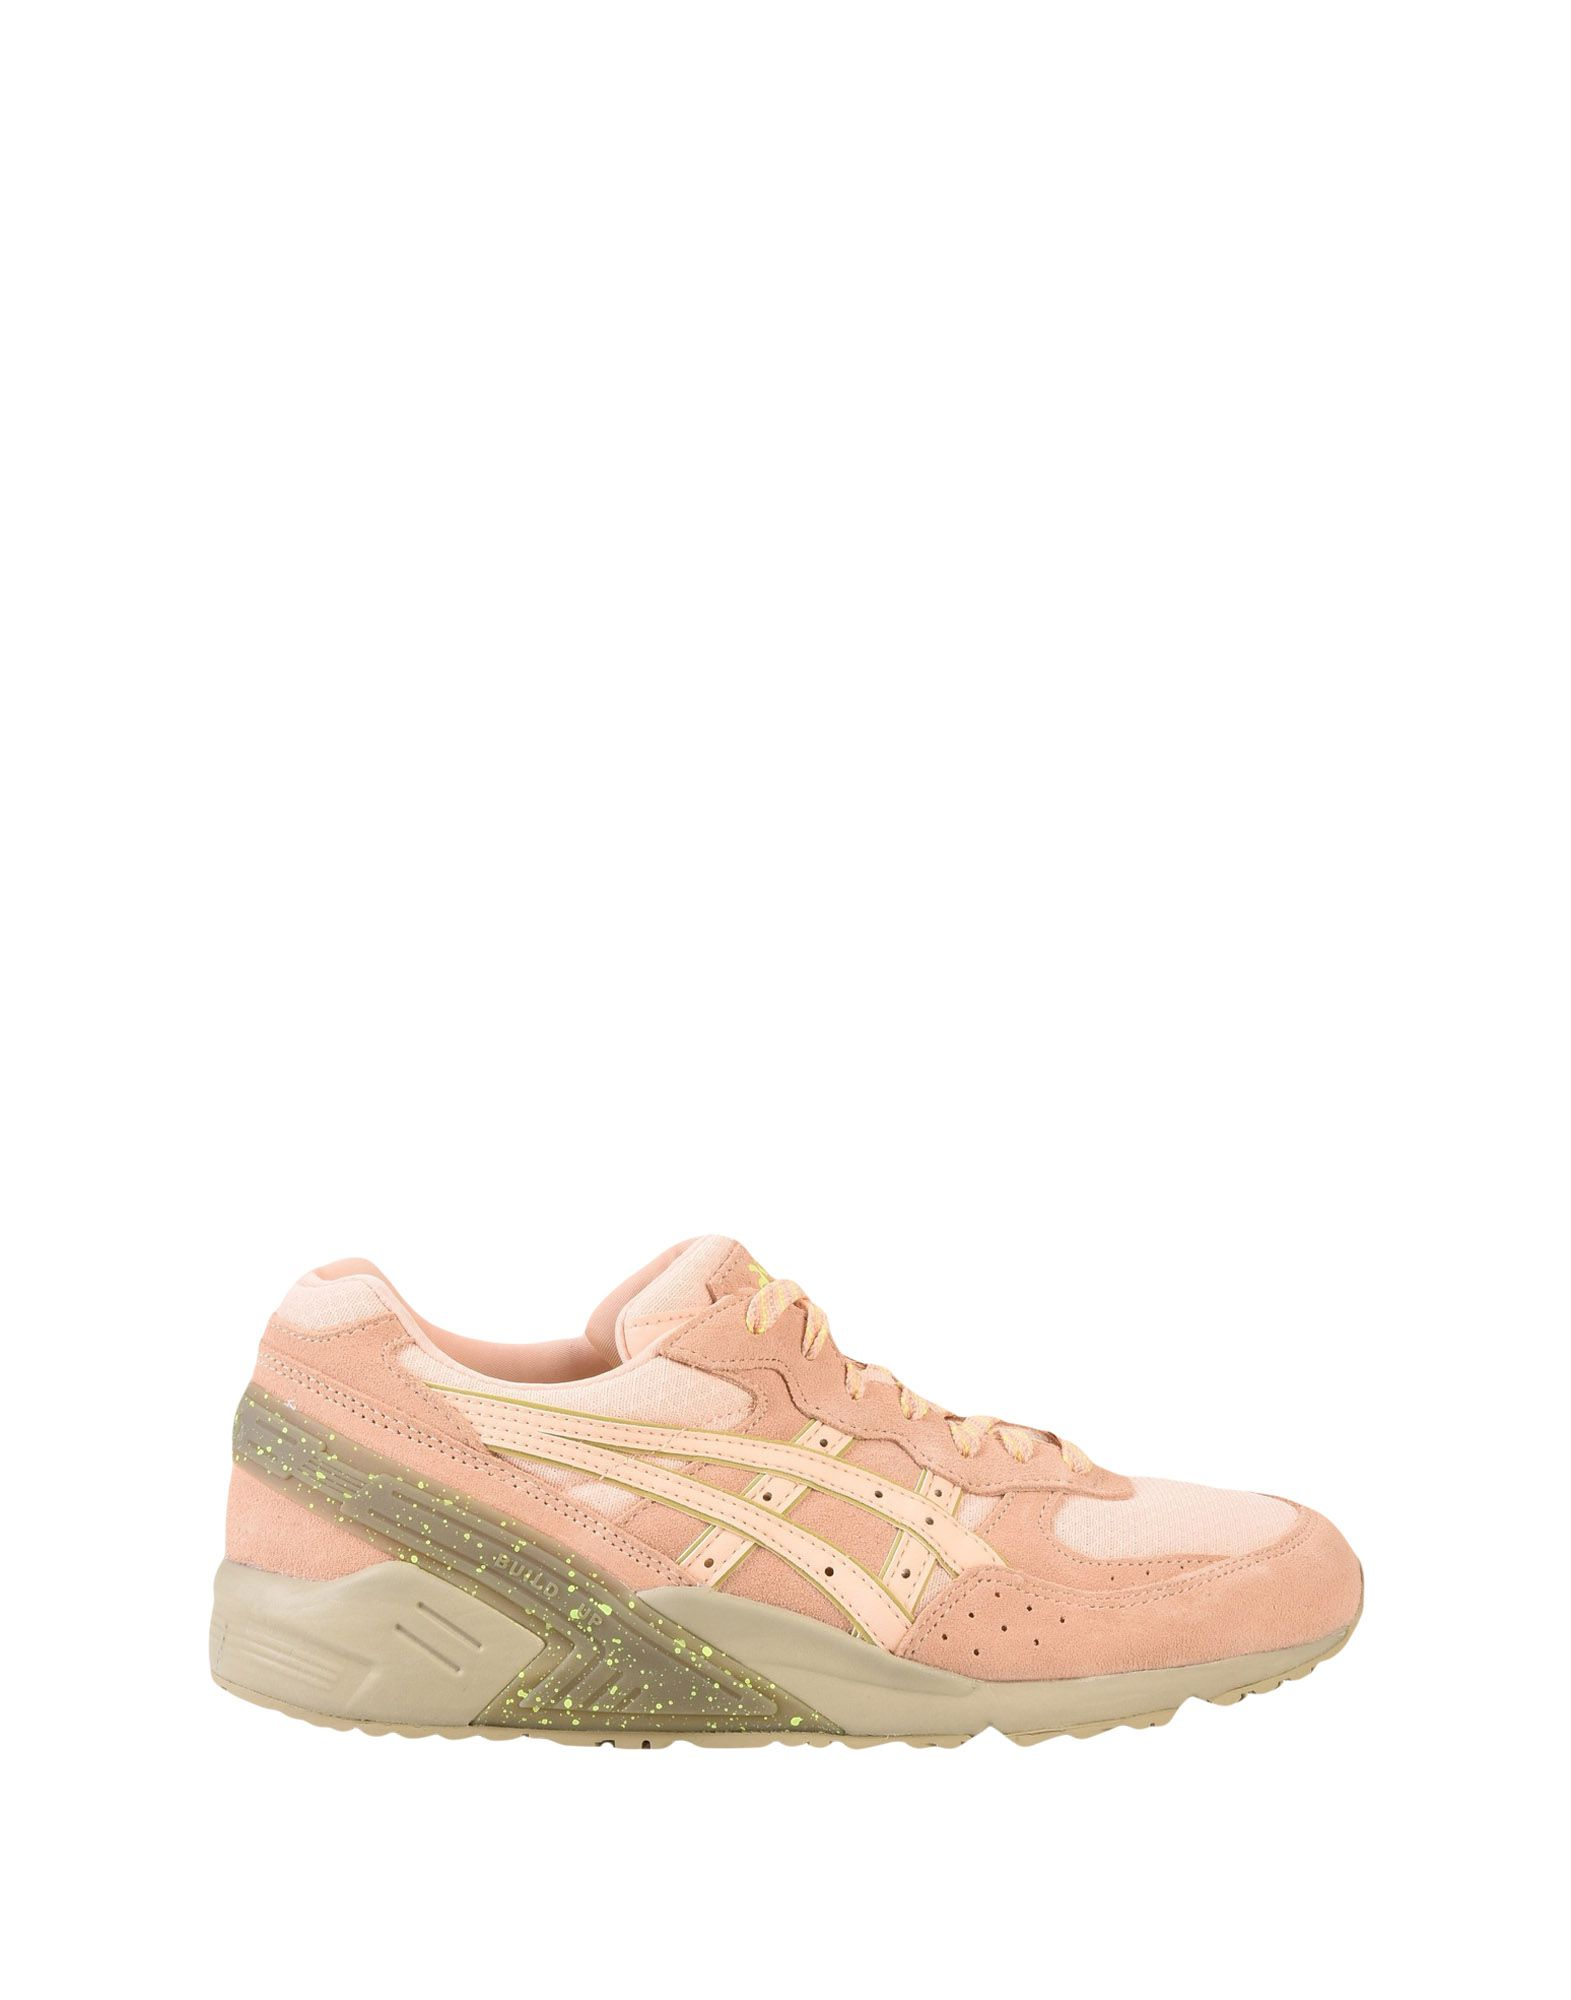 Sneakers Asics Gel Sigh - Femme - Sneakers Asics sur